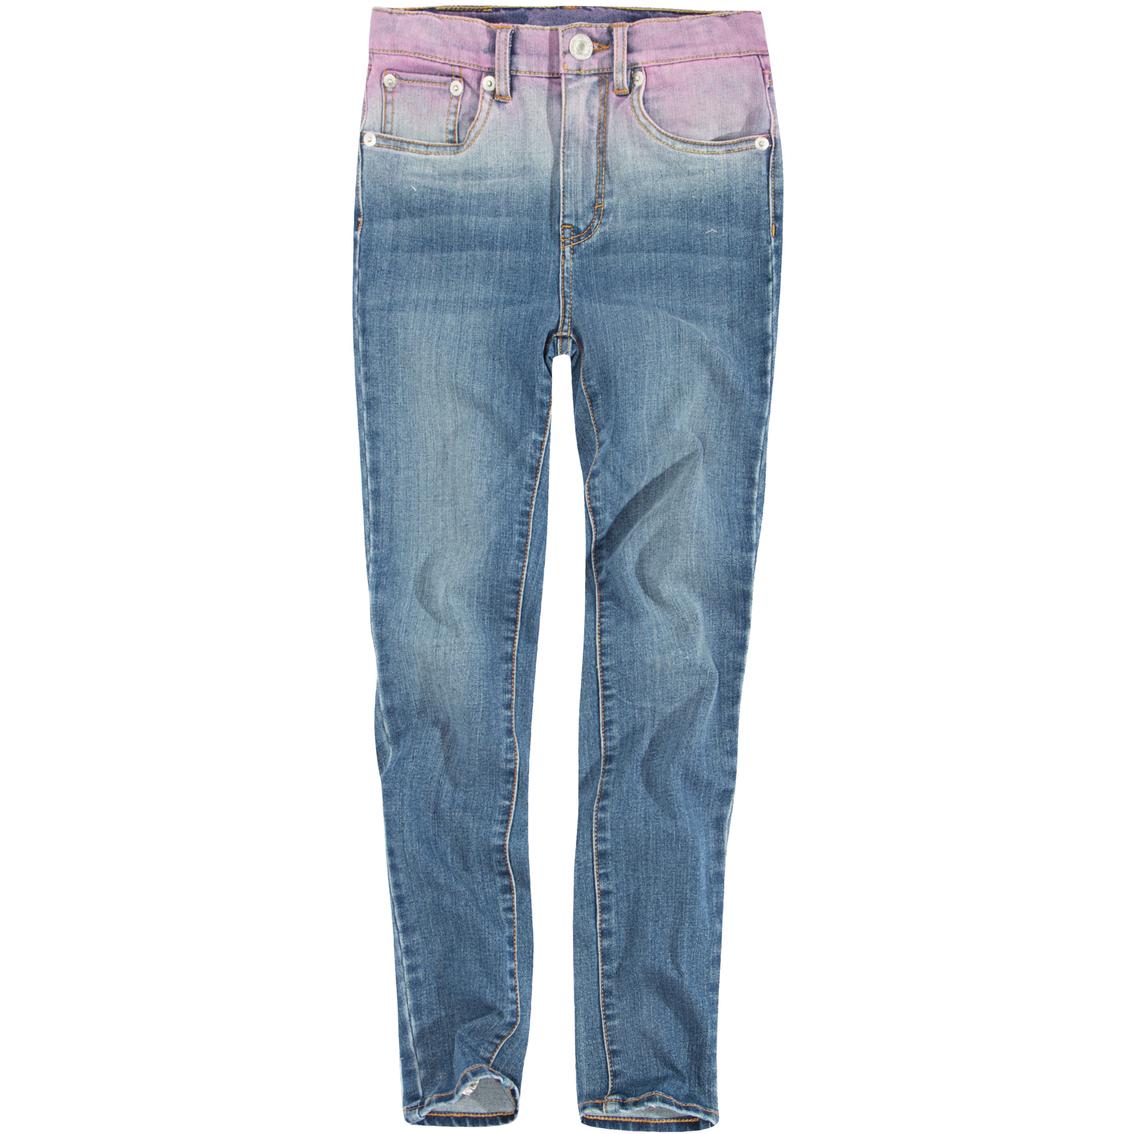 Girls Super Skinny Stretch Denim Jeans